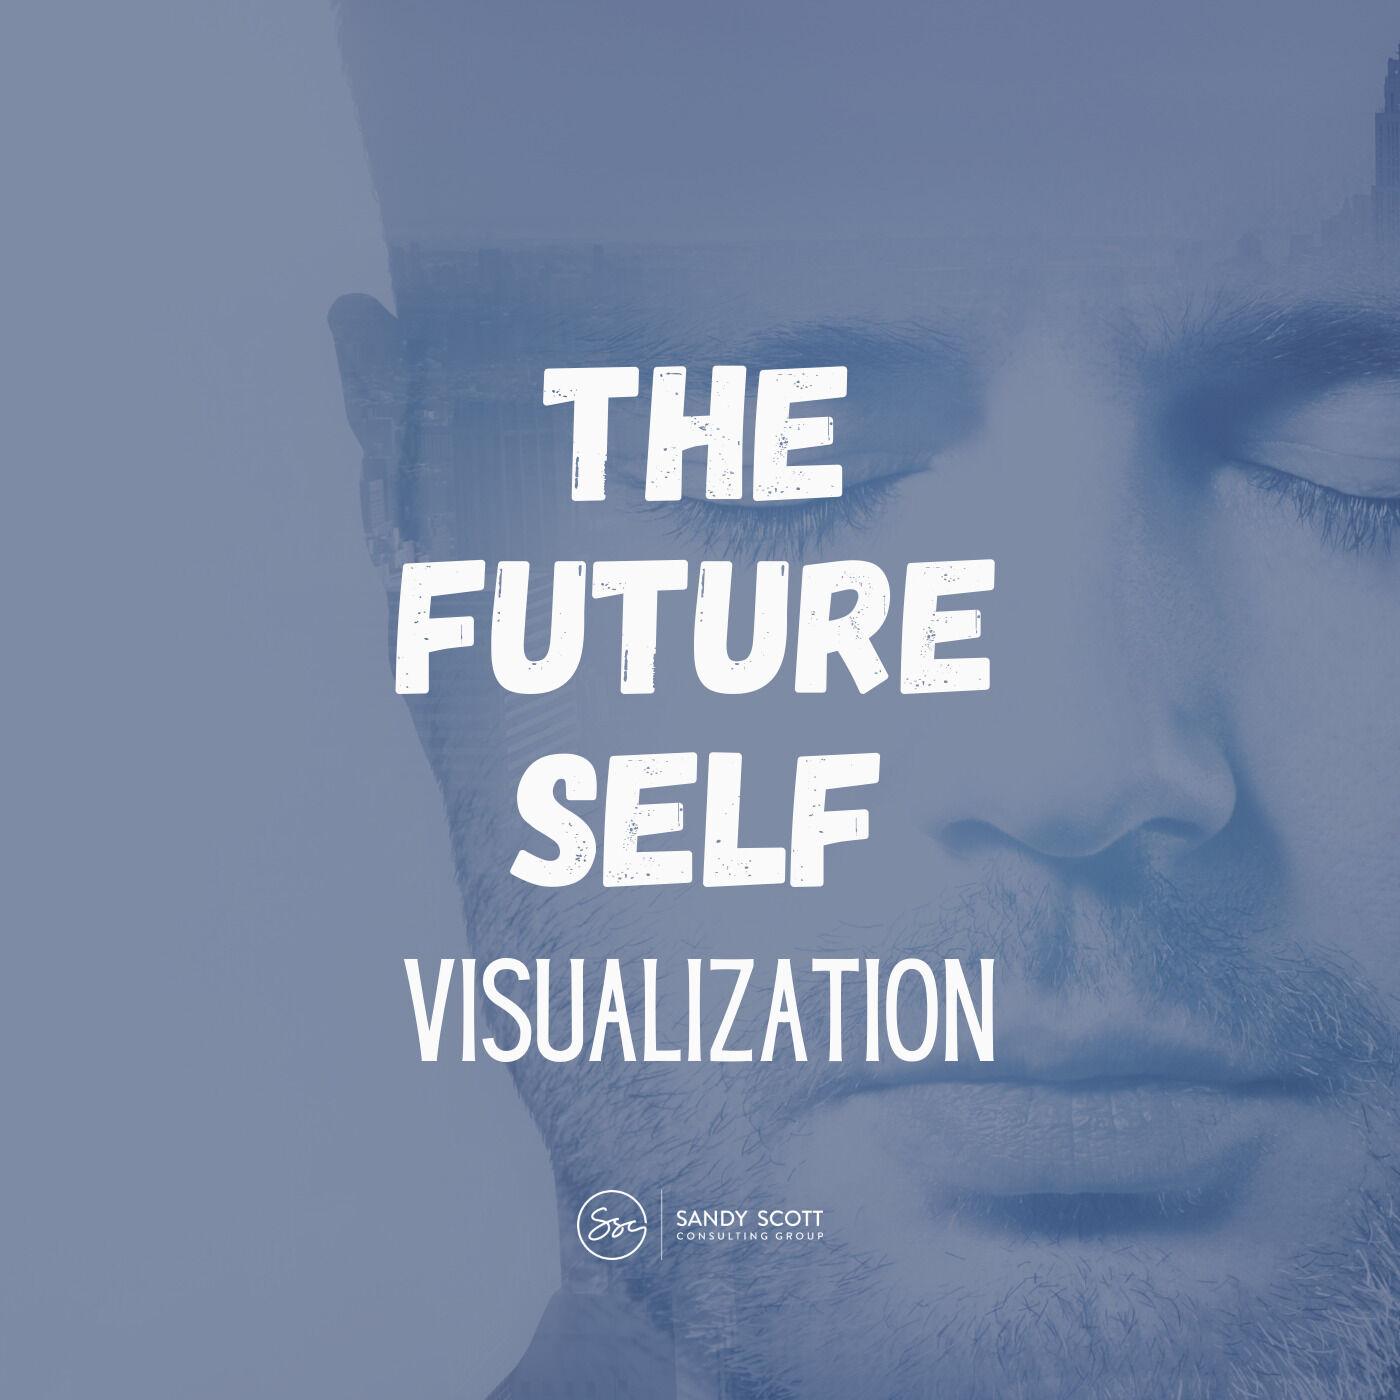 The Future Self (Visualization)